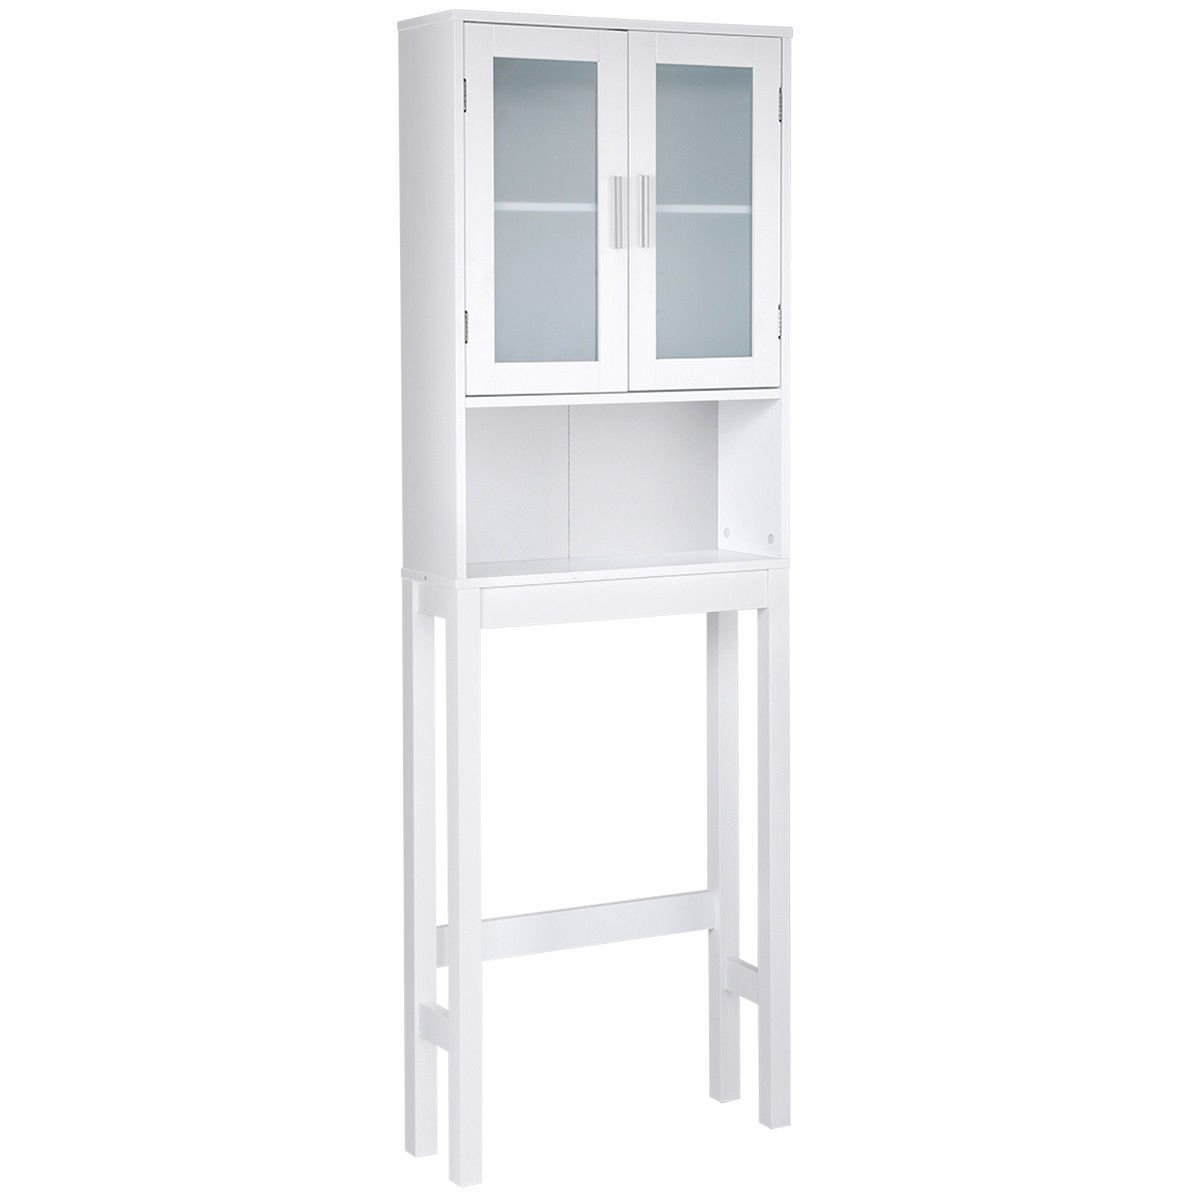 Bathroom Over The Toilet Storage Wooden Cabinet Spacesaver Organizer Tower Rack